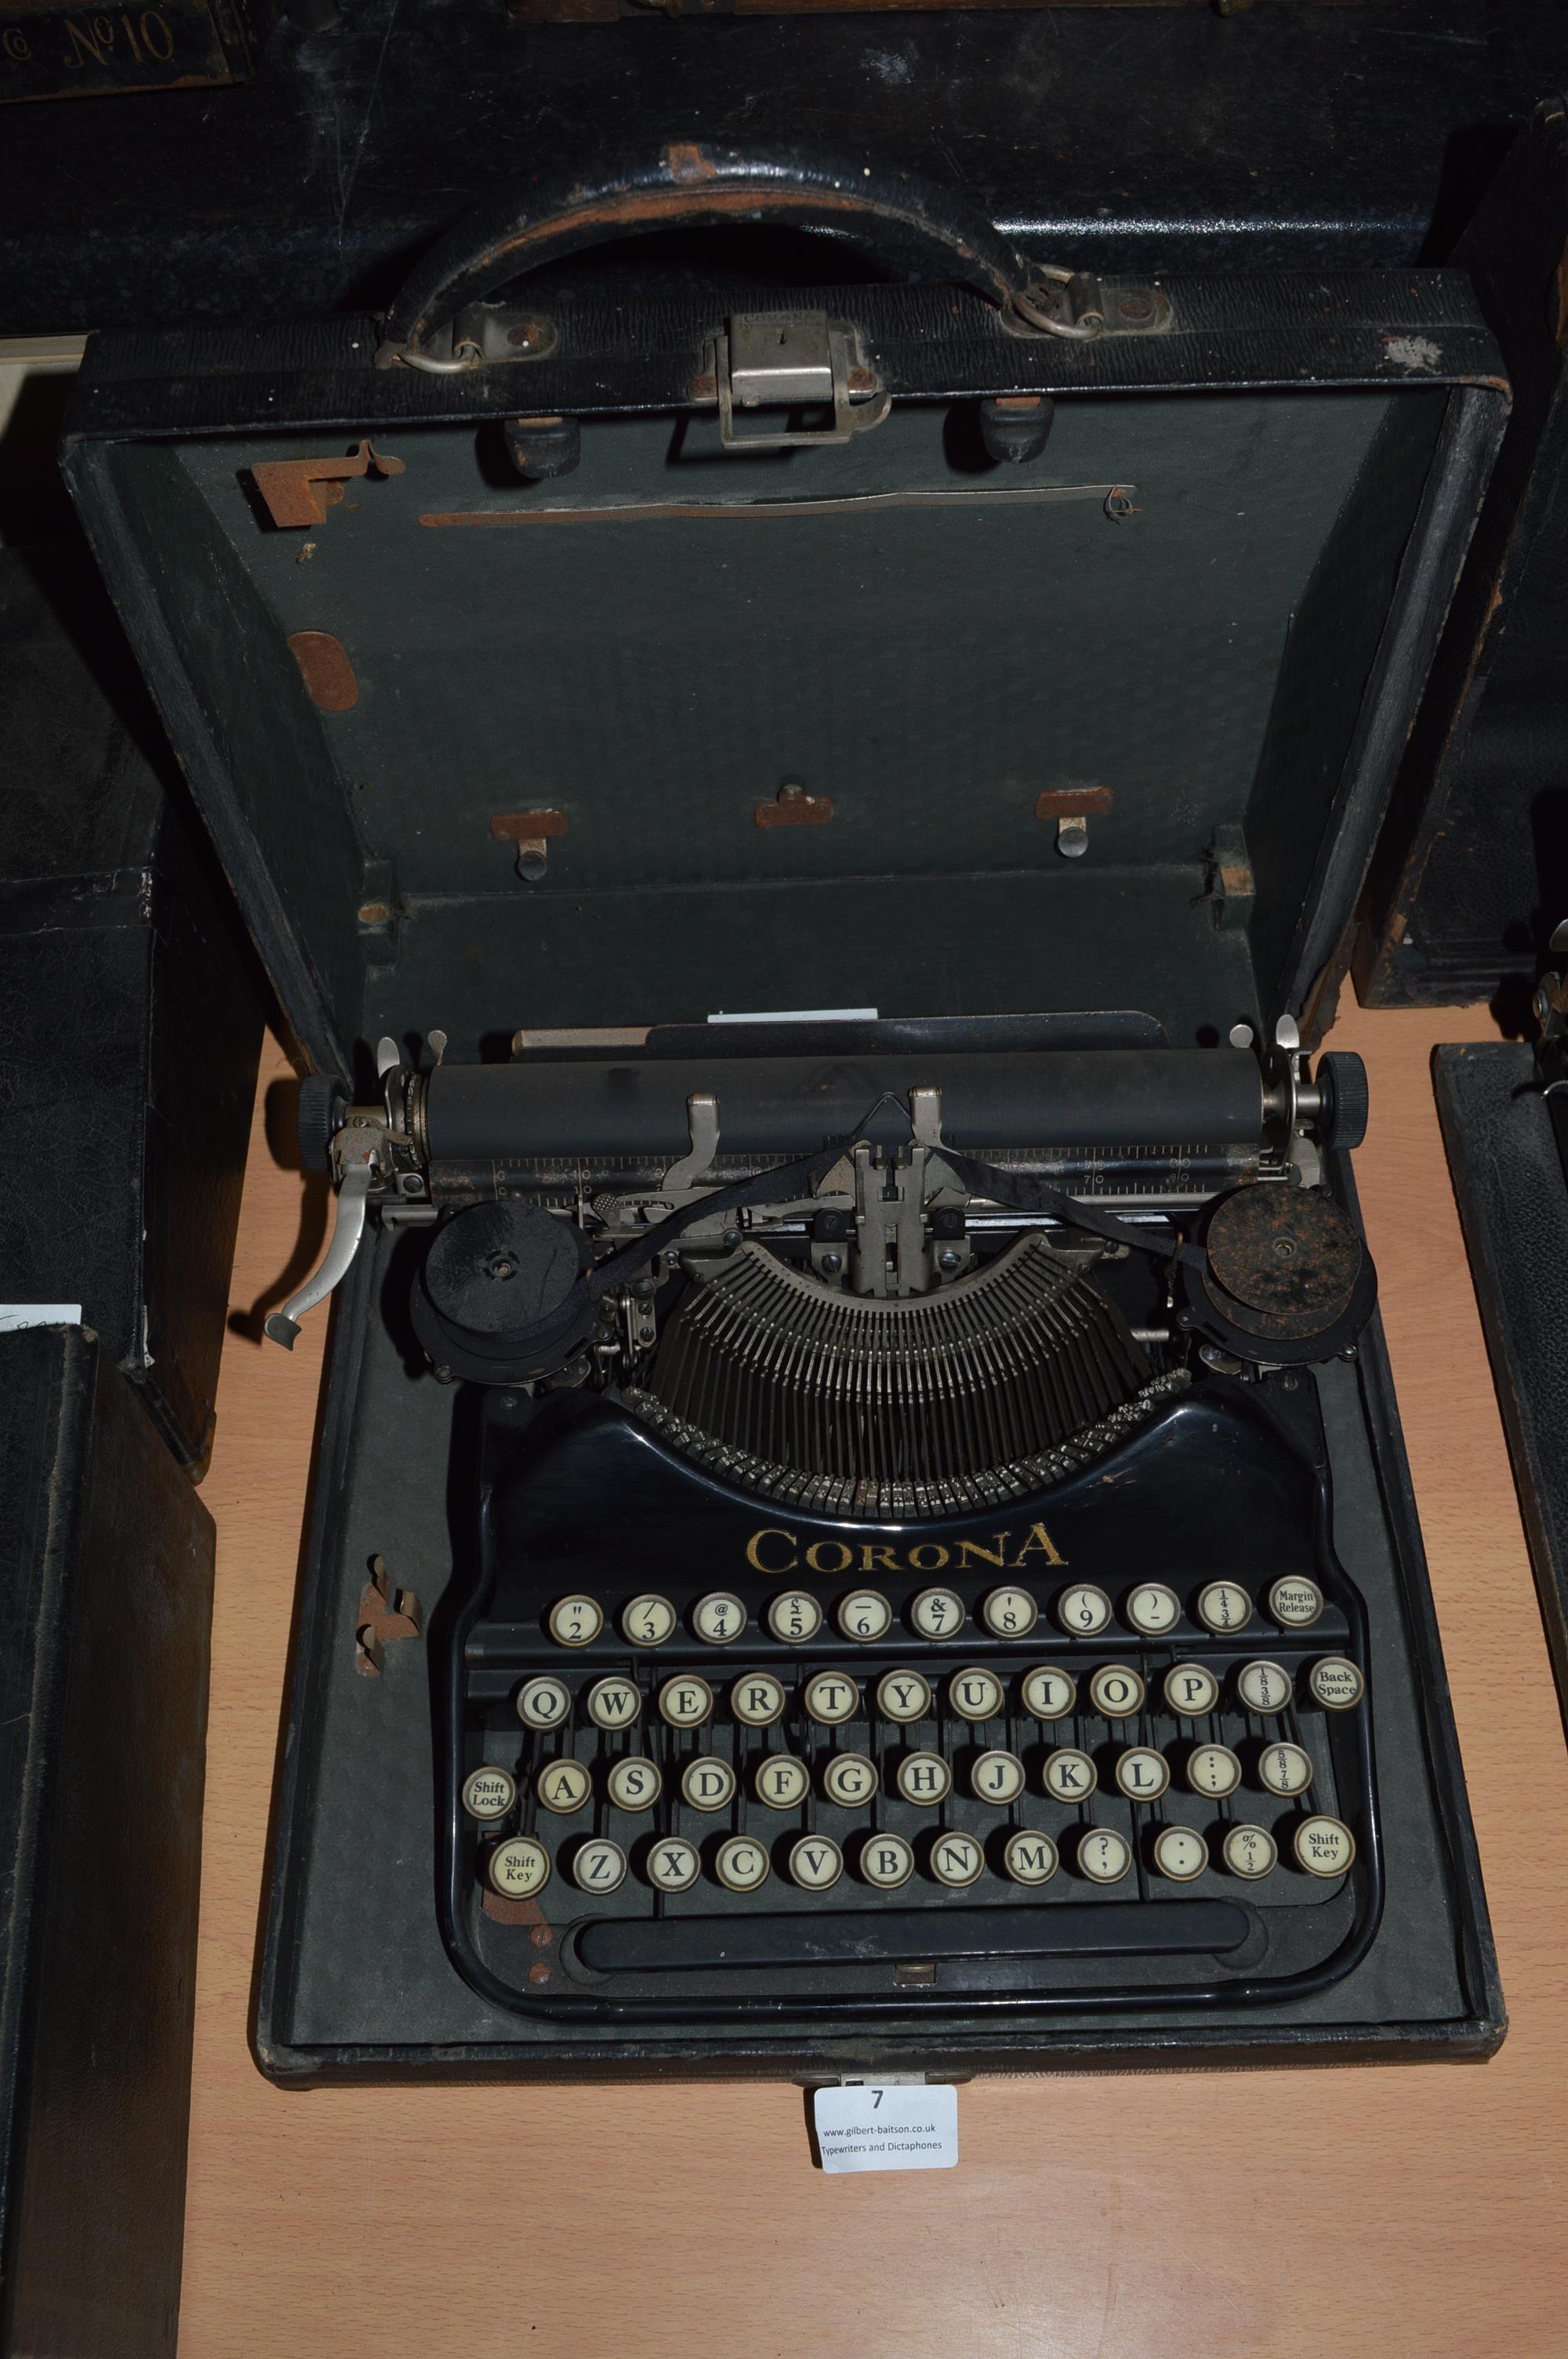 Corona Portable Typewriter with Original Carry Case - Image 2 of 2